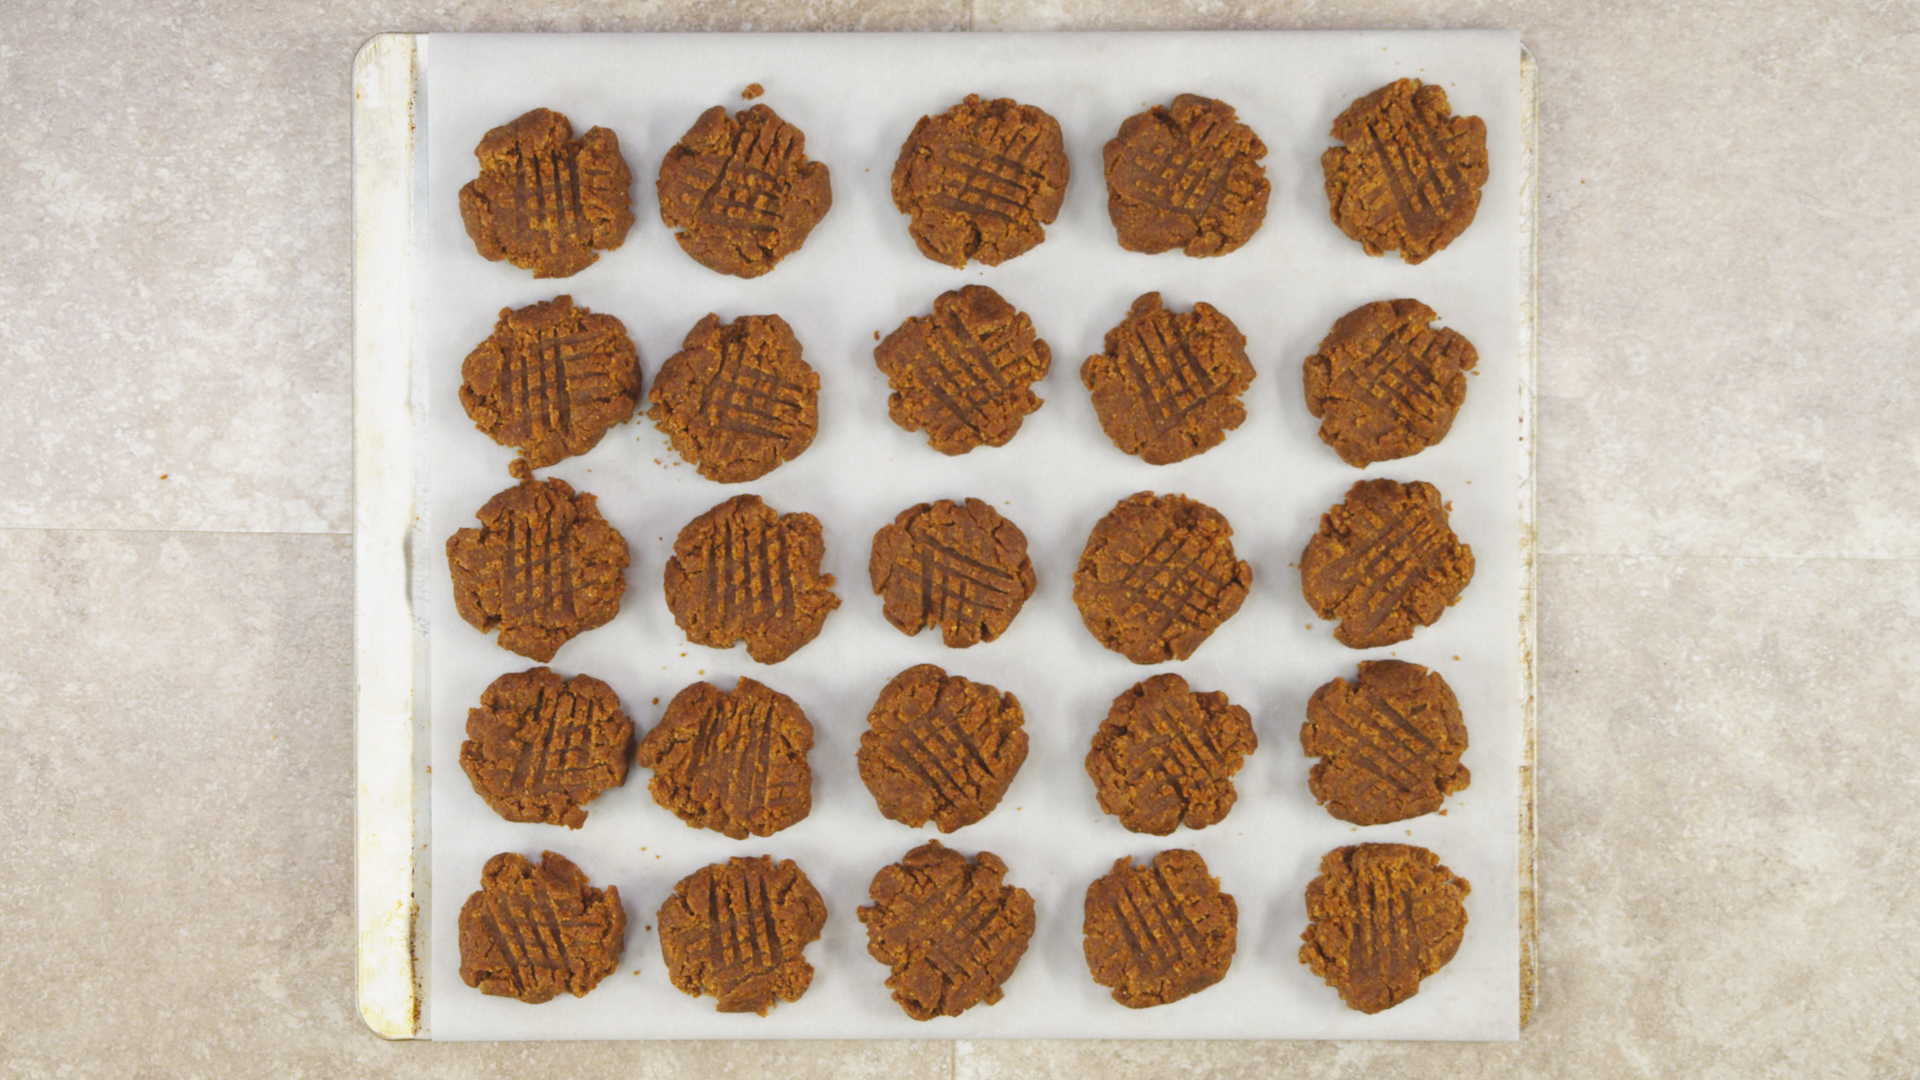 Peanut-Butter Cookies pan